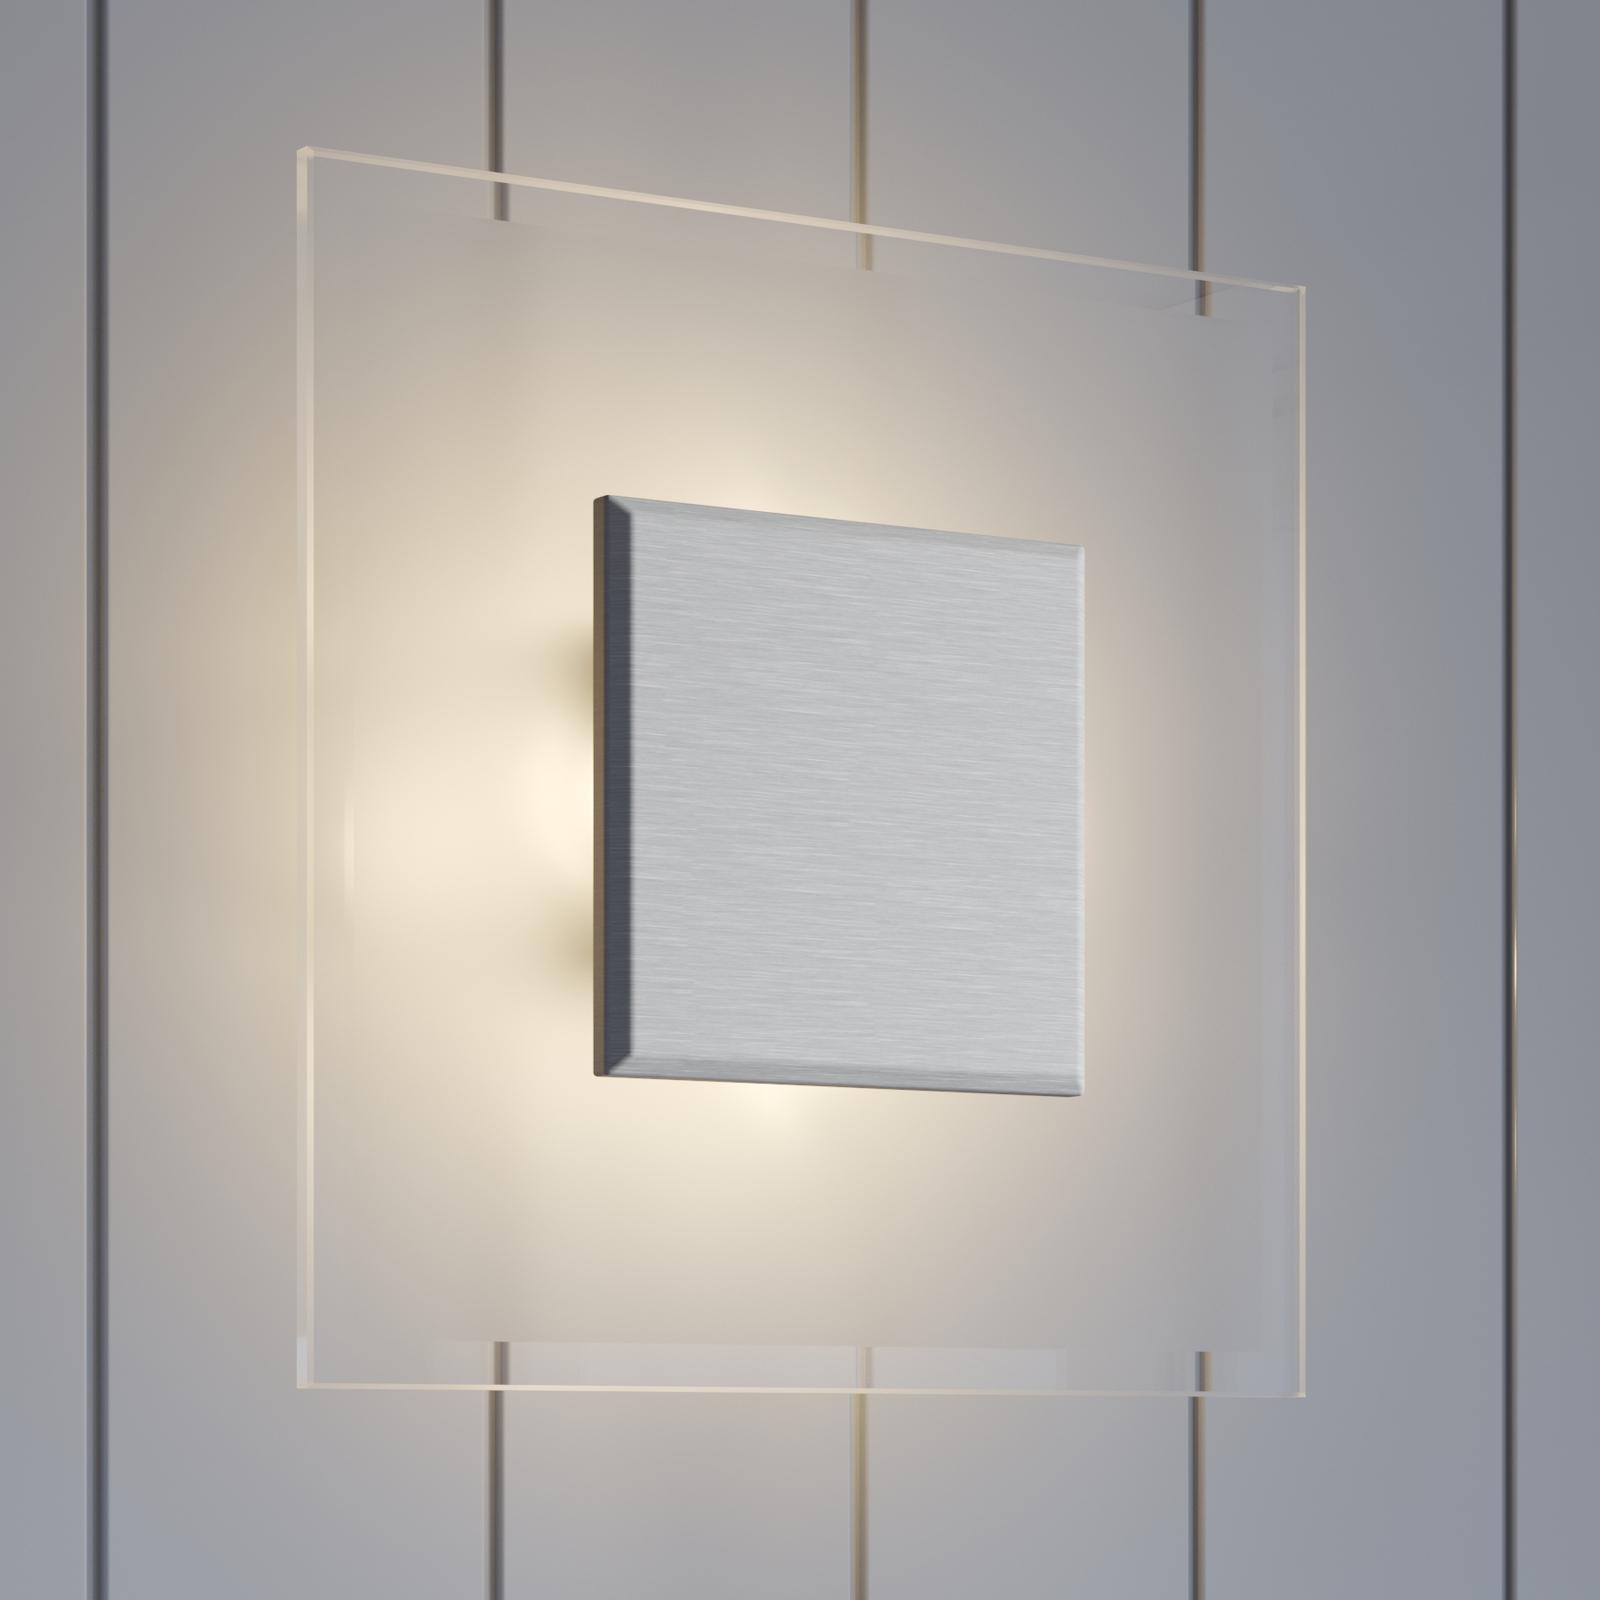 Vierkante LED-plafondlamp Lole van glas